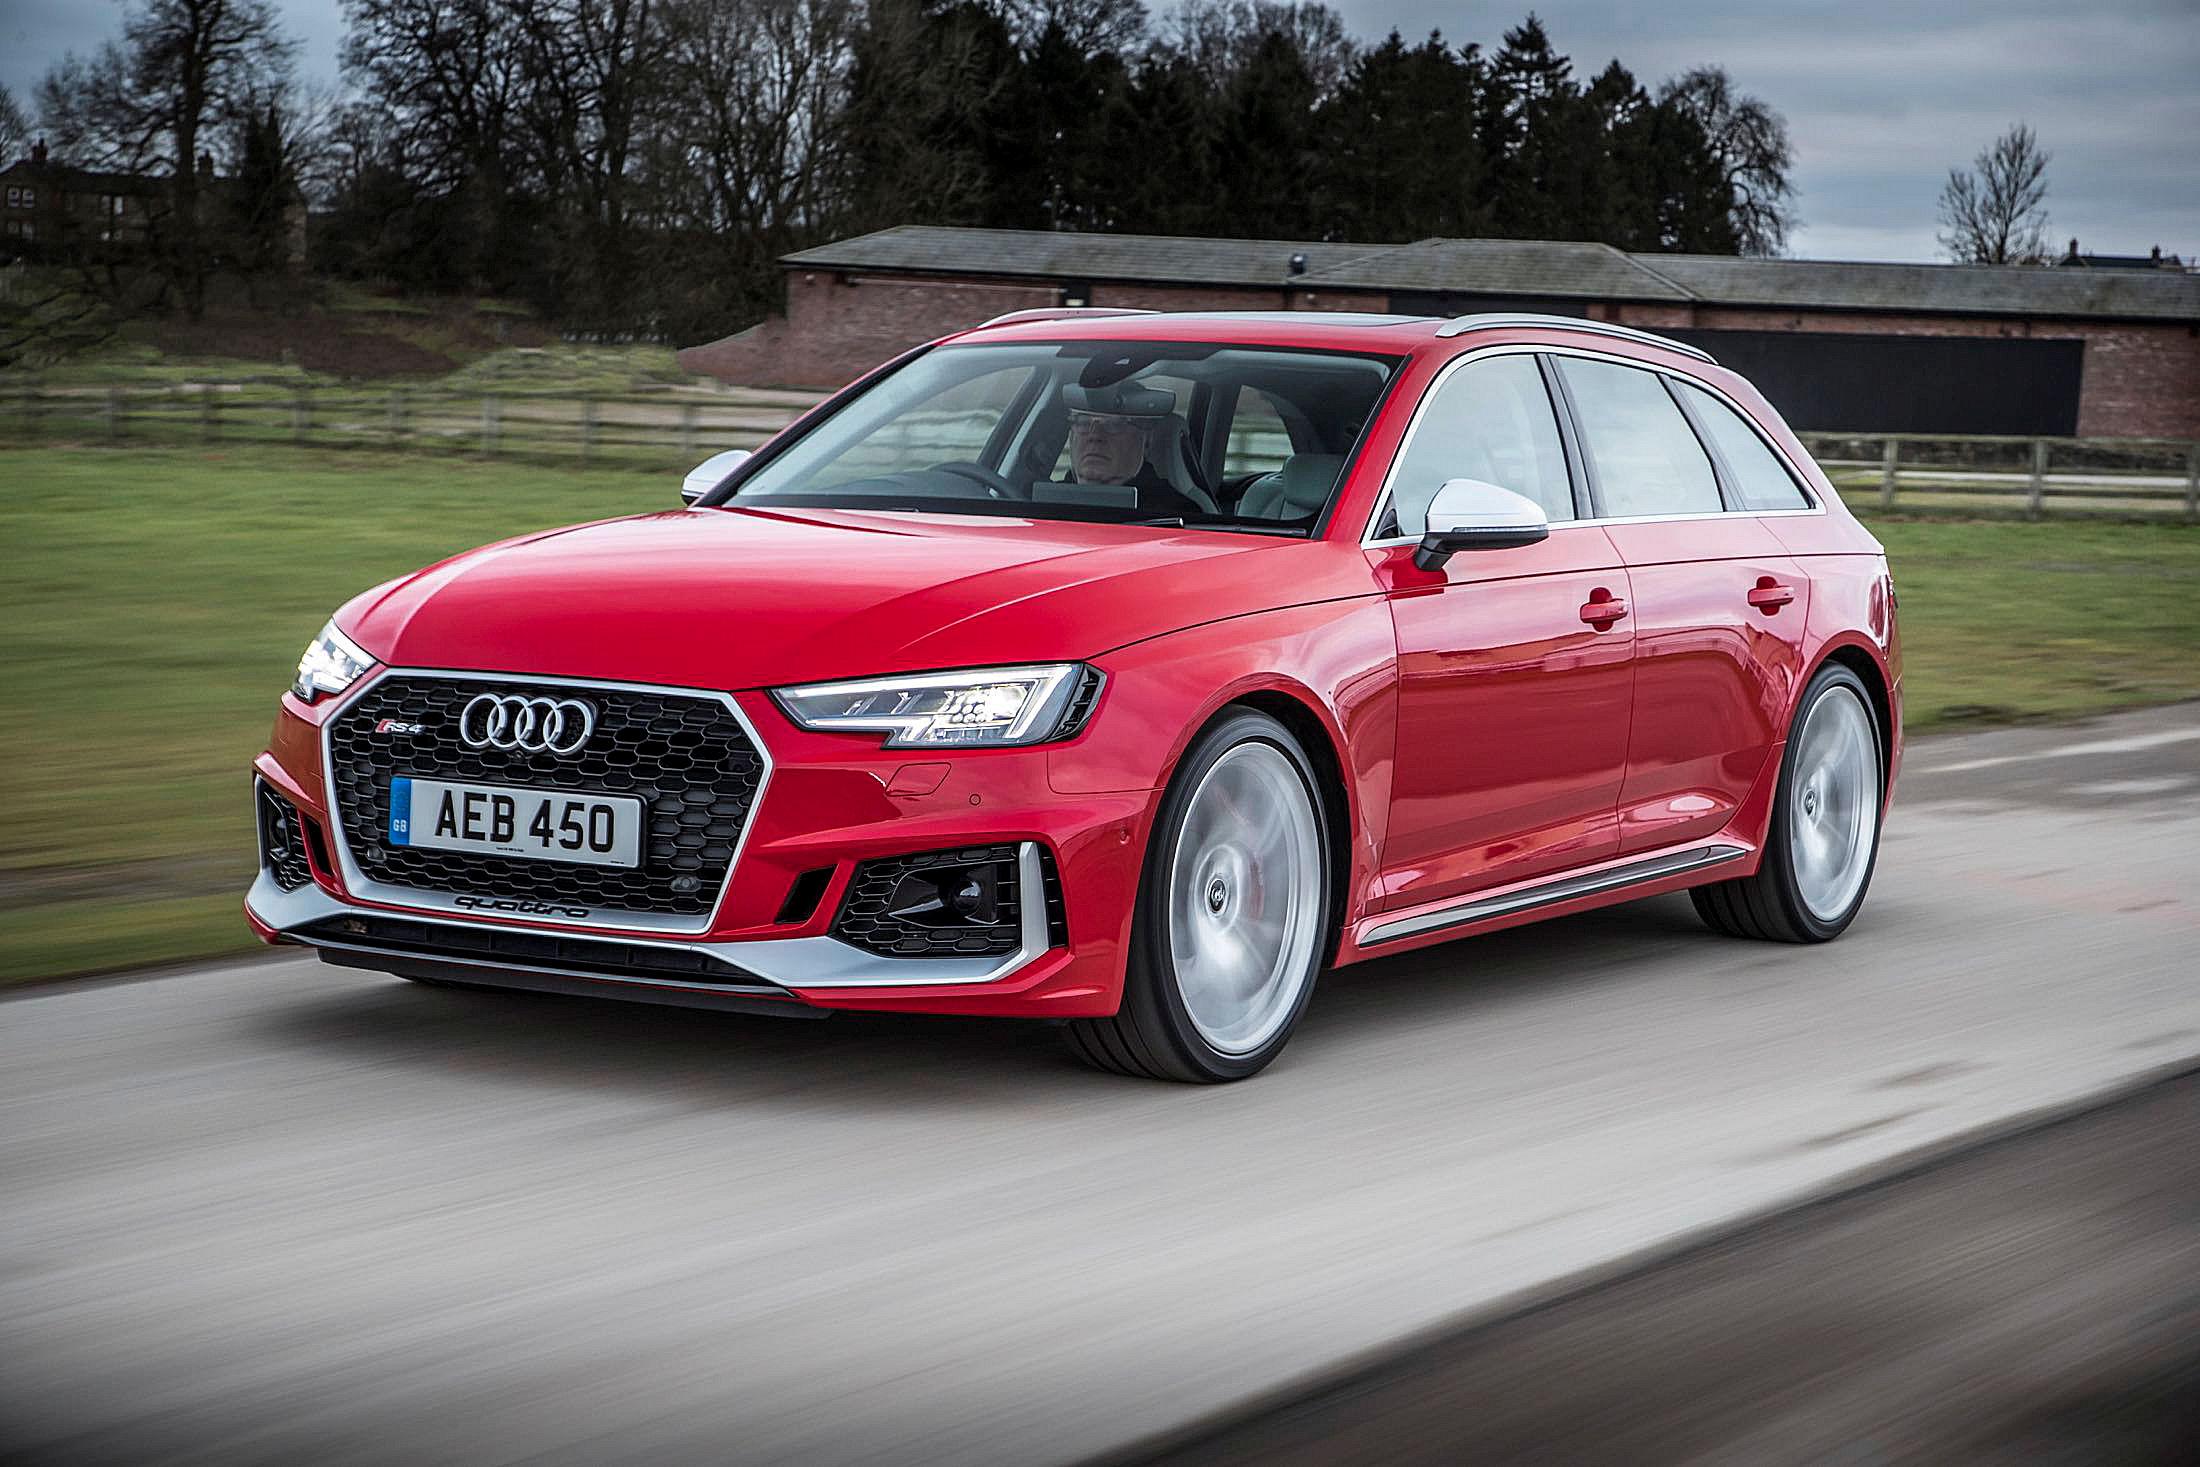 Audi Rs4 Avant Road Test Wheels Alive